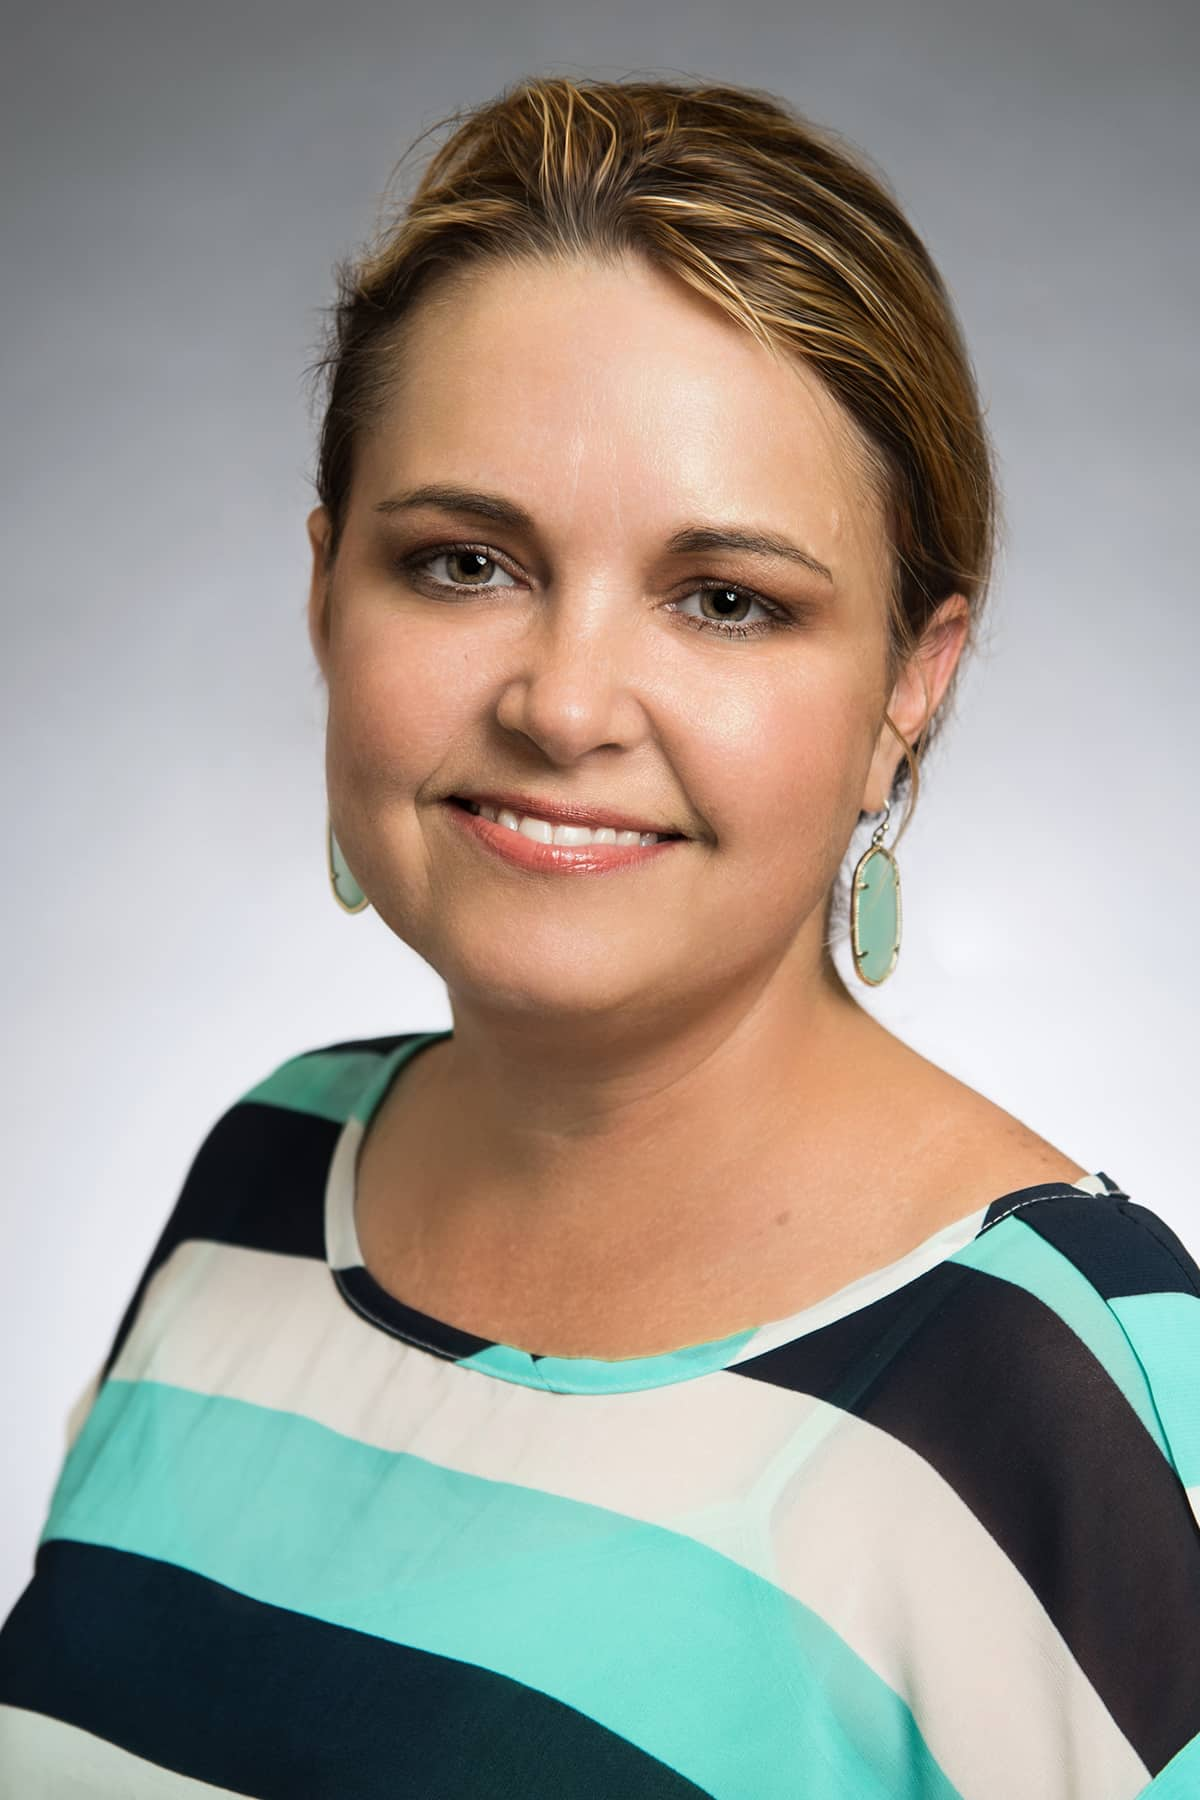 Julie S. Bortolotti  Doctor in Houston, Texas